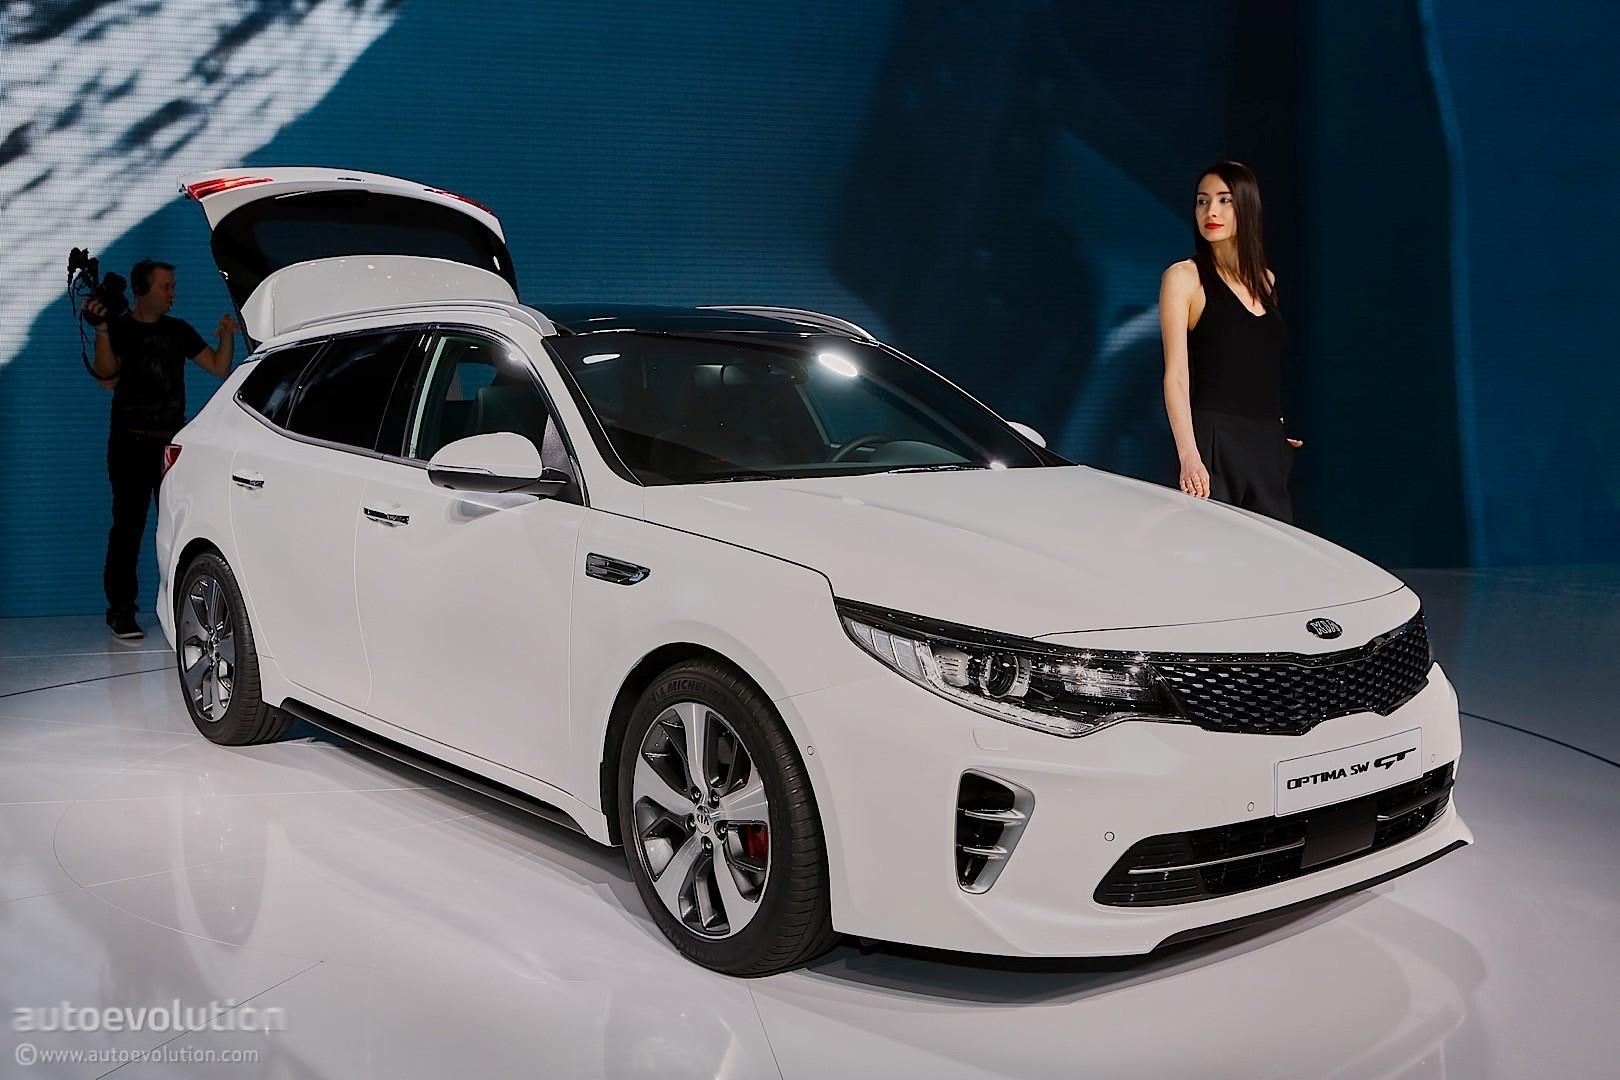 2016 Kia Optima Sportswagon Lands in Geneva - autoevolution